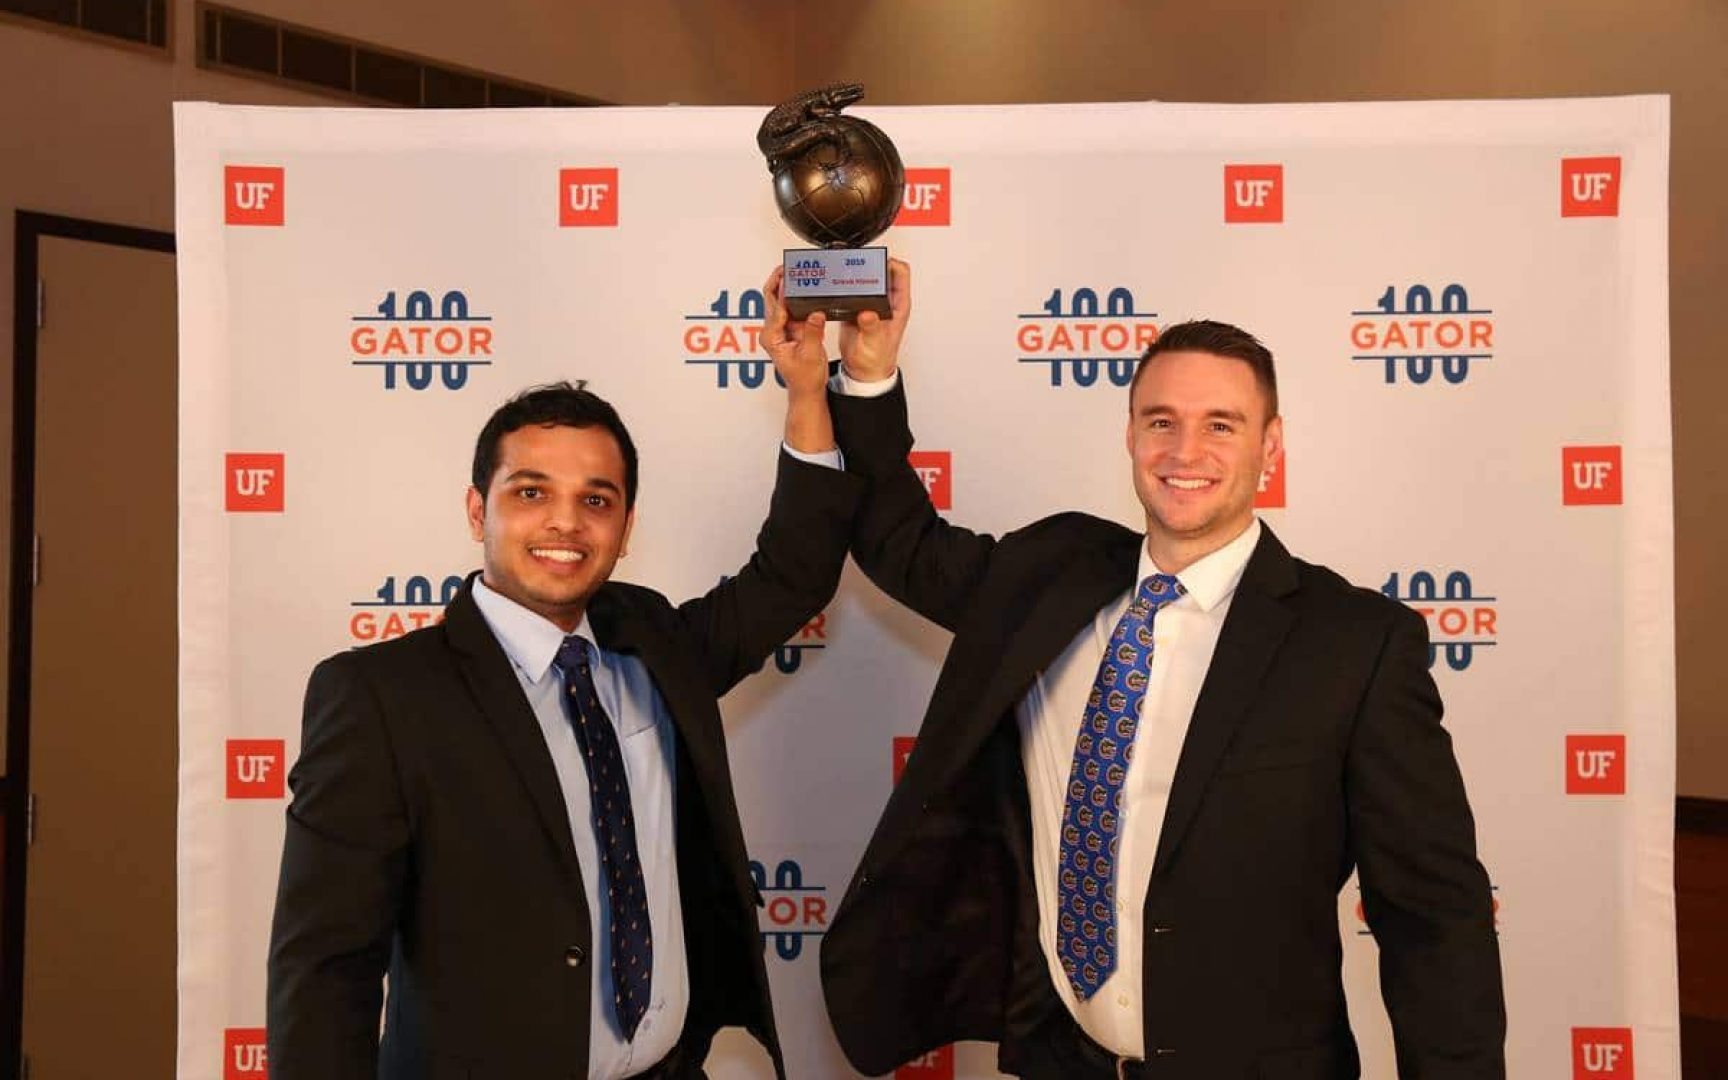 Karthik Shanadi and Luke McGurrin hold up their Gator100 trophy